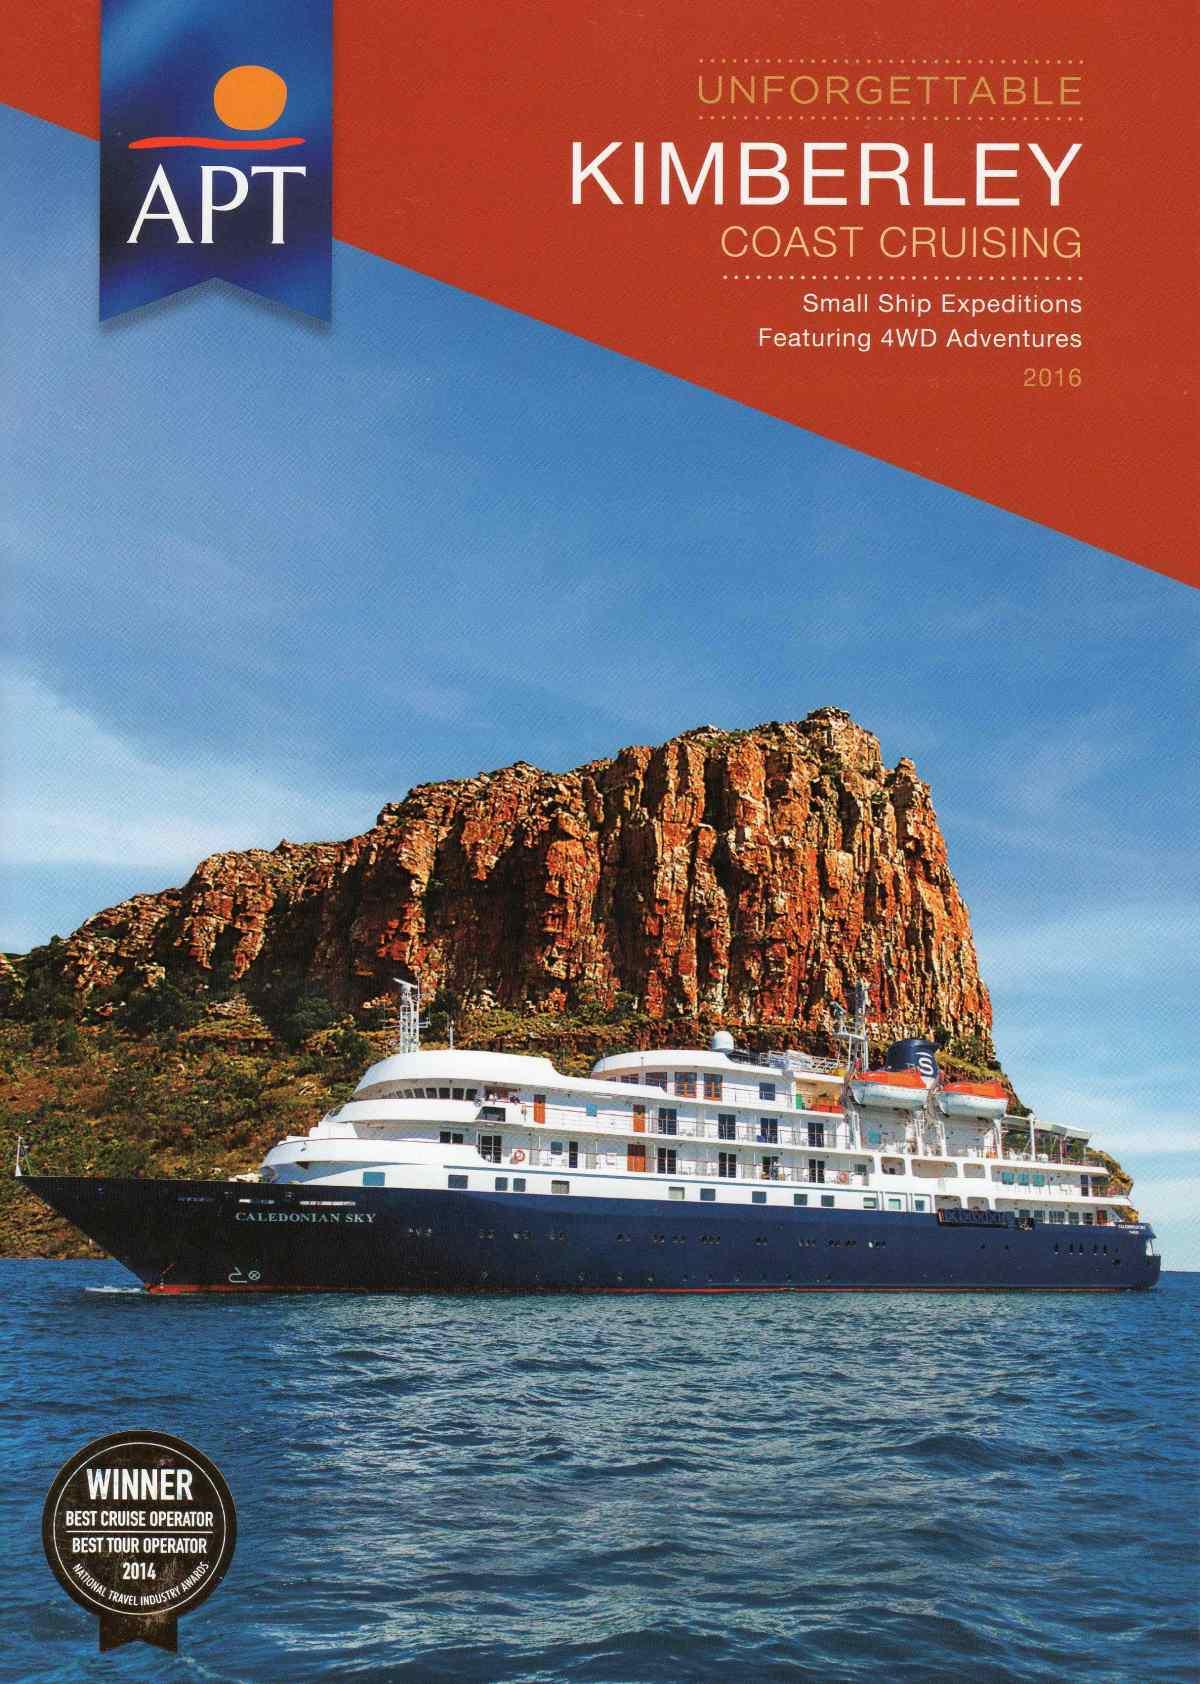 APT Kimberley Coast Cruising Brochure